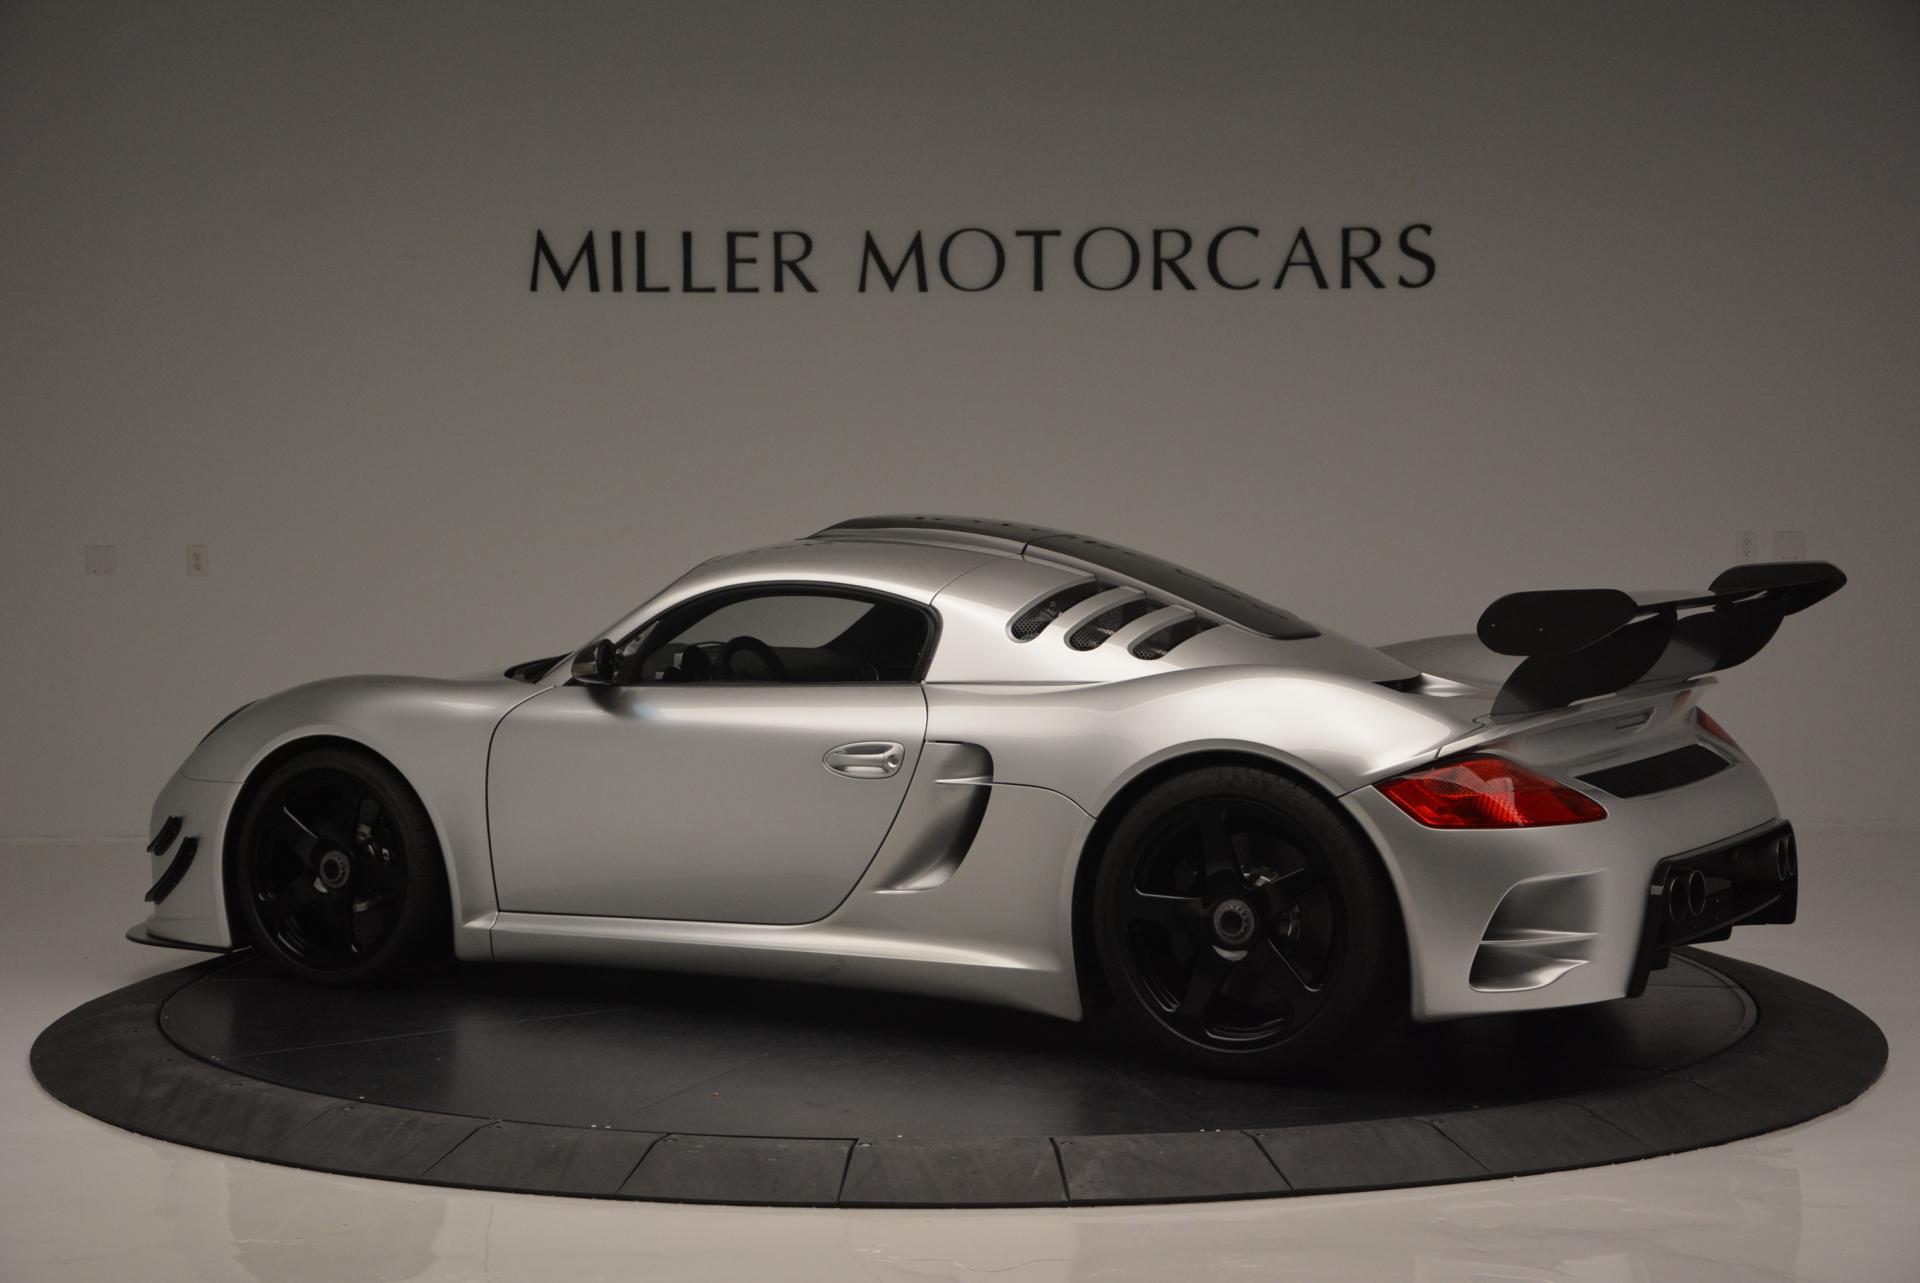 Used 2012 Porsche RUF CTR-3 Clubsport For Sale In Westport, CT 110_p4